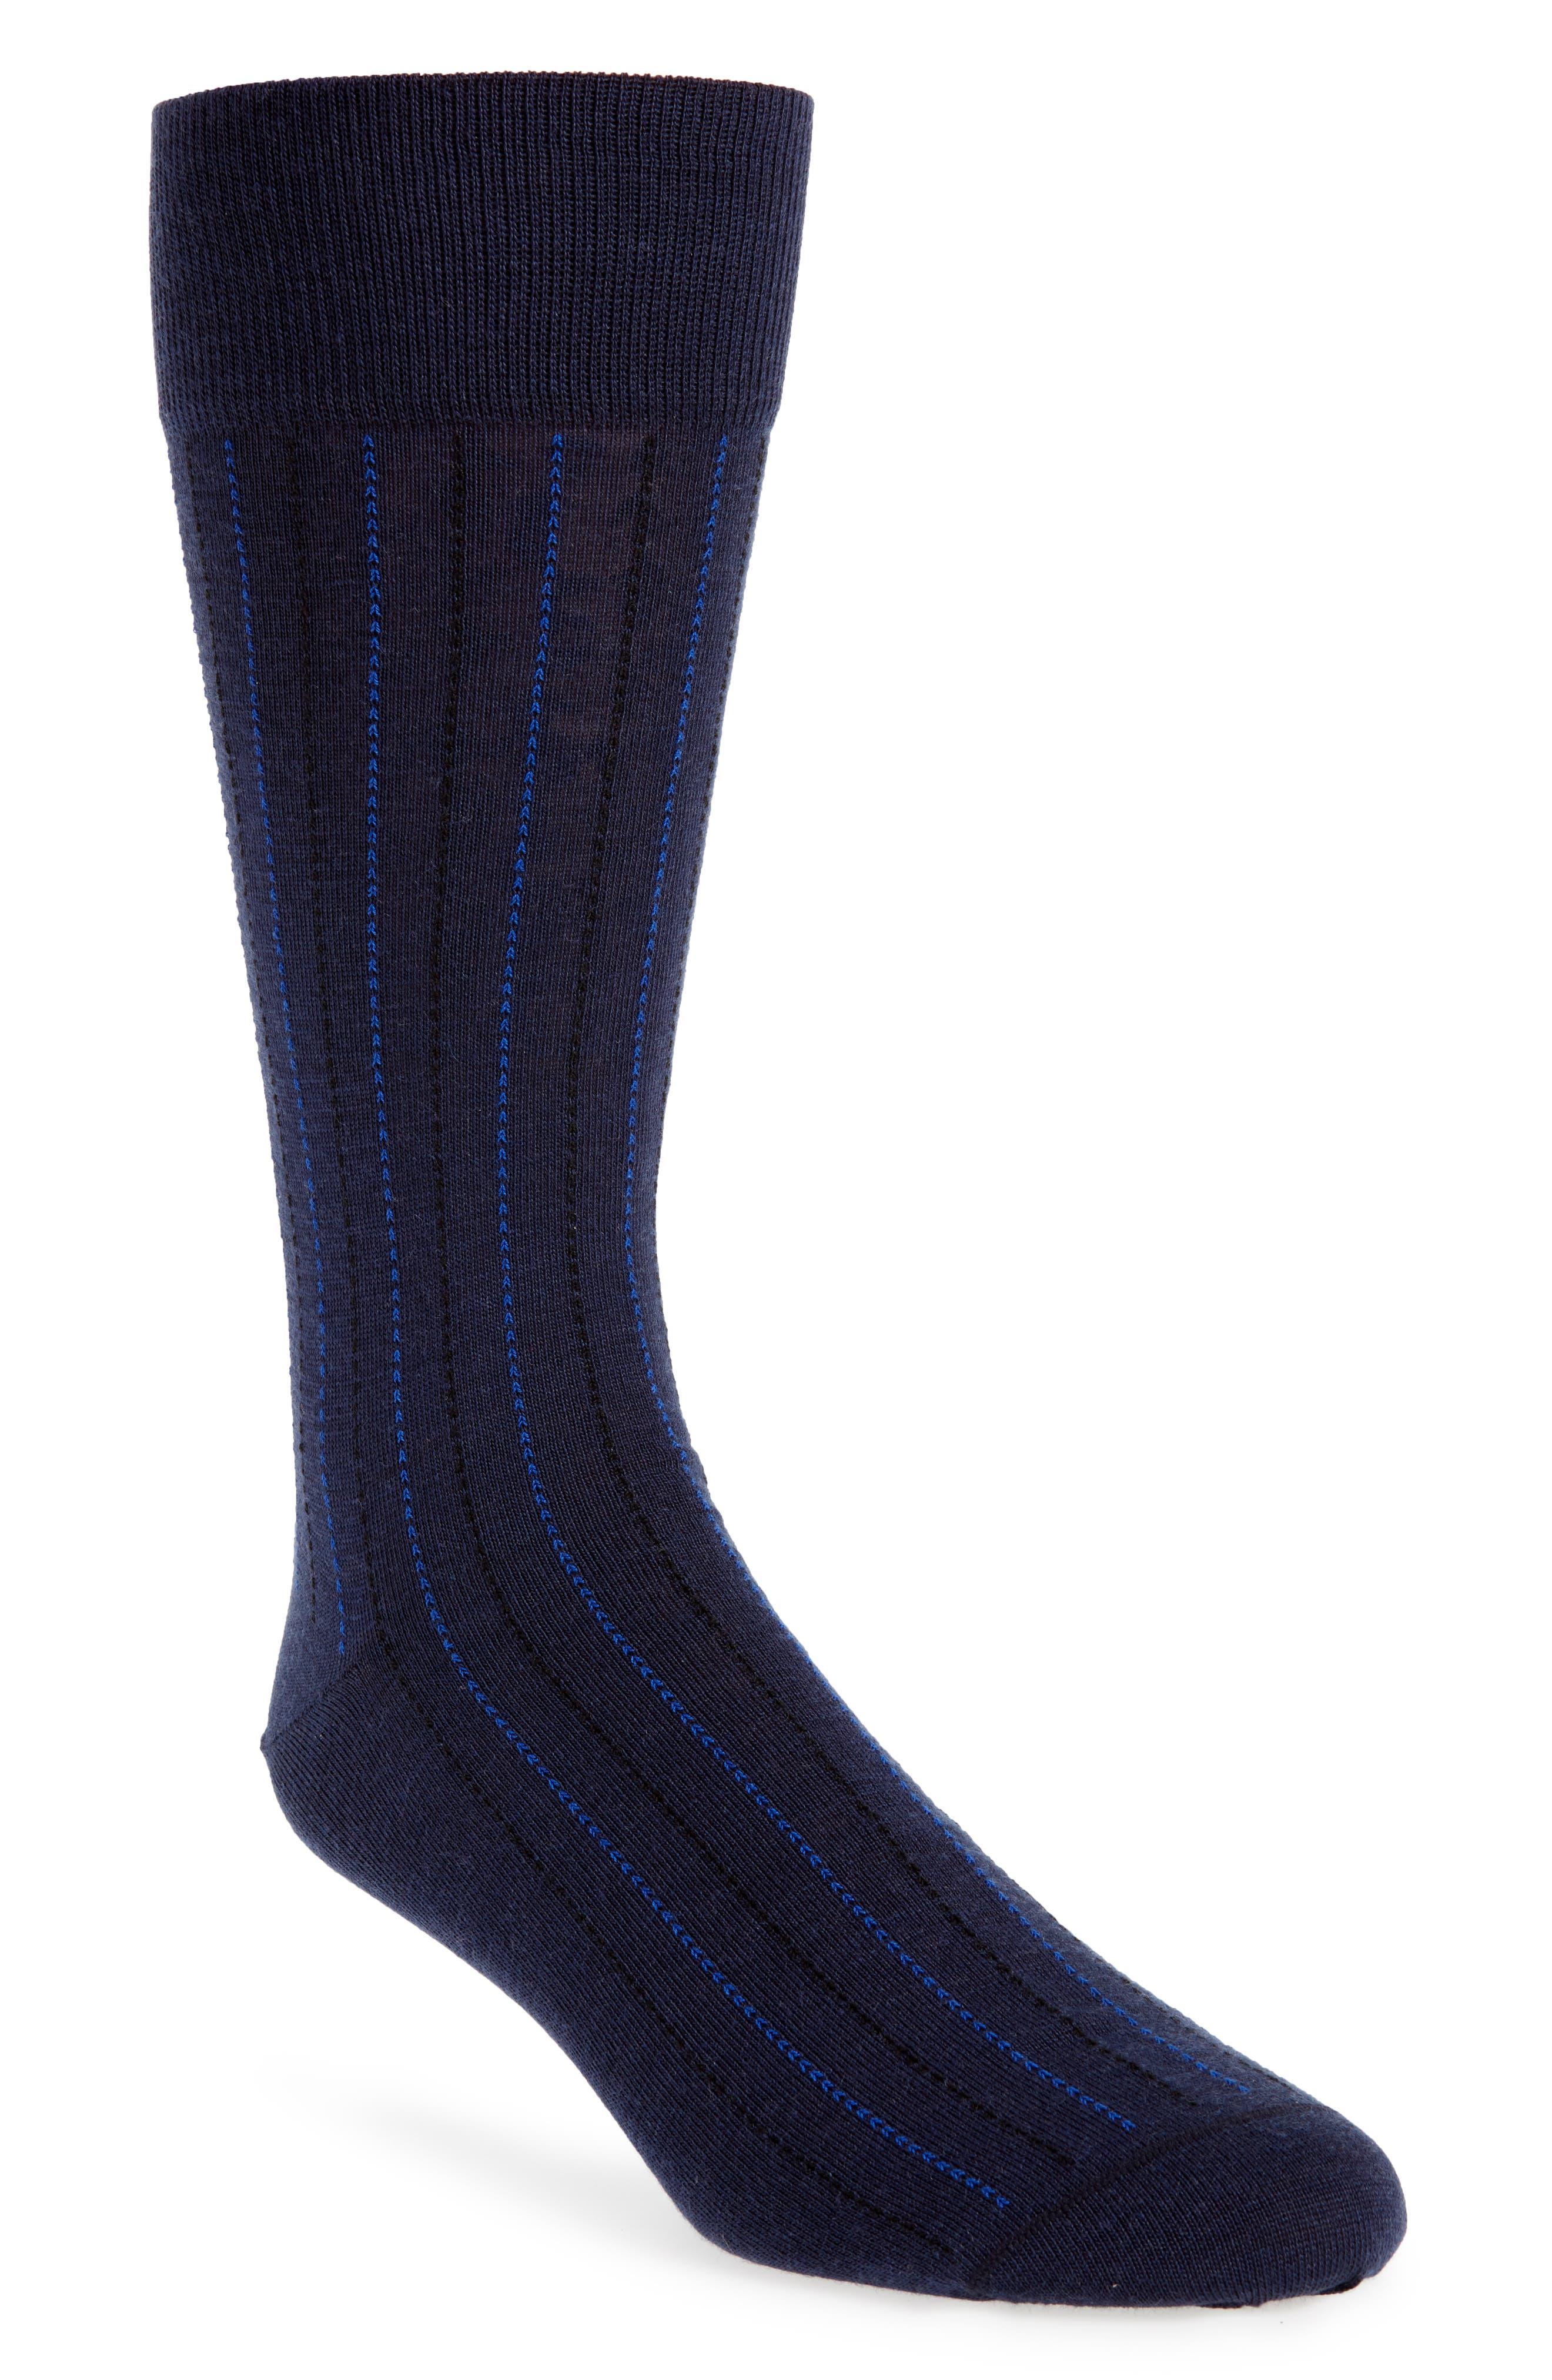 Vertical Lines Socks,                         Main,                         color, Navy